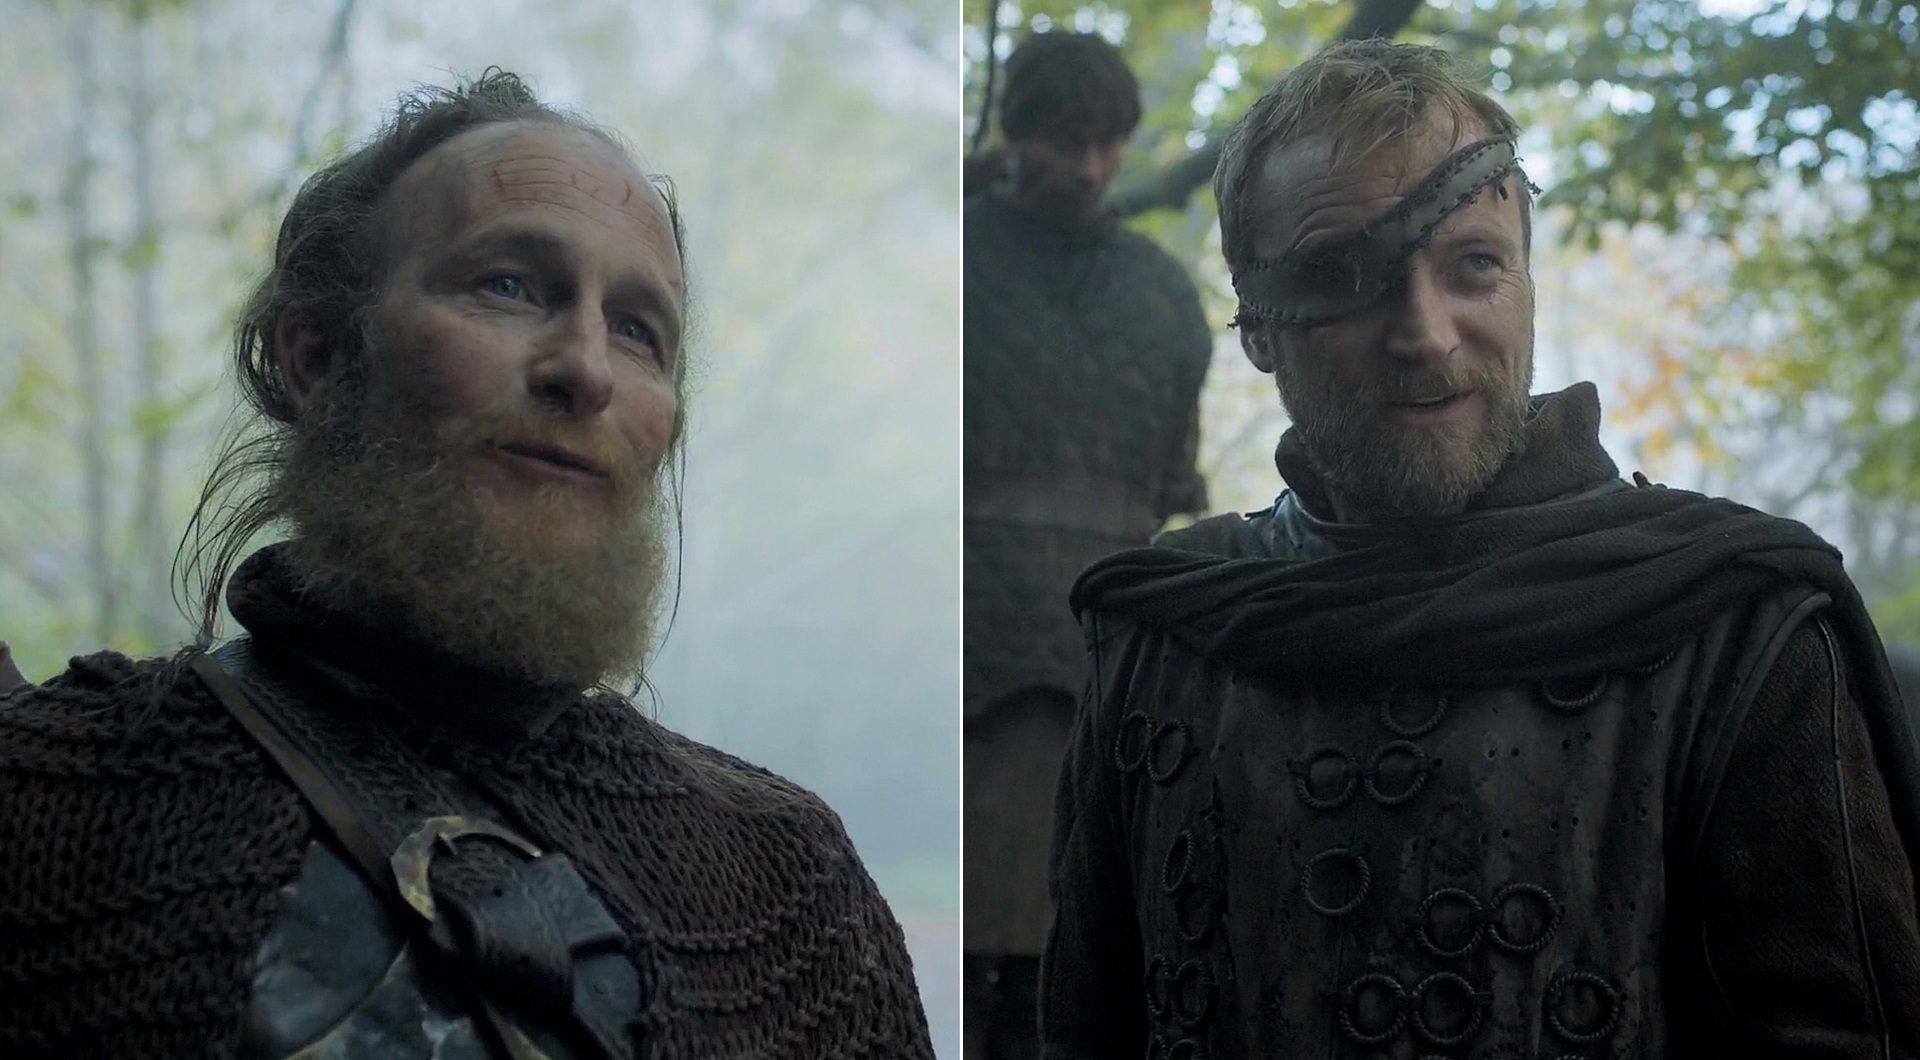 Paul Kaye as Thoros of Myr & Richard Dormer as Beric Dondarrion